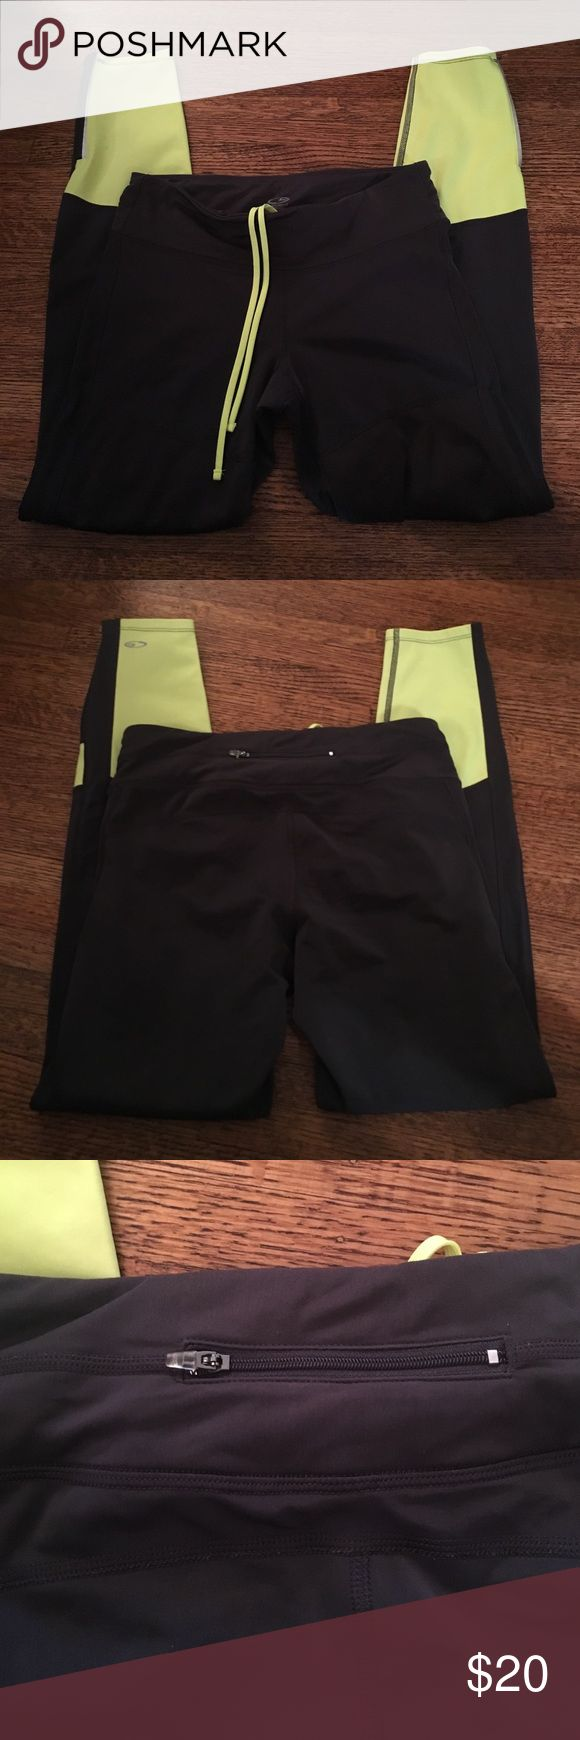 Champion duo dry leggings Brand new, never worn Champion Pants Leggings